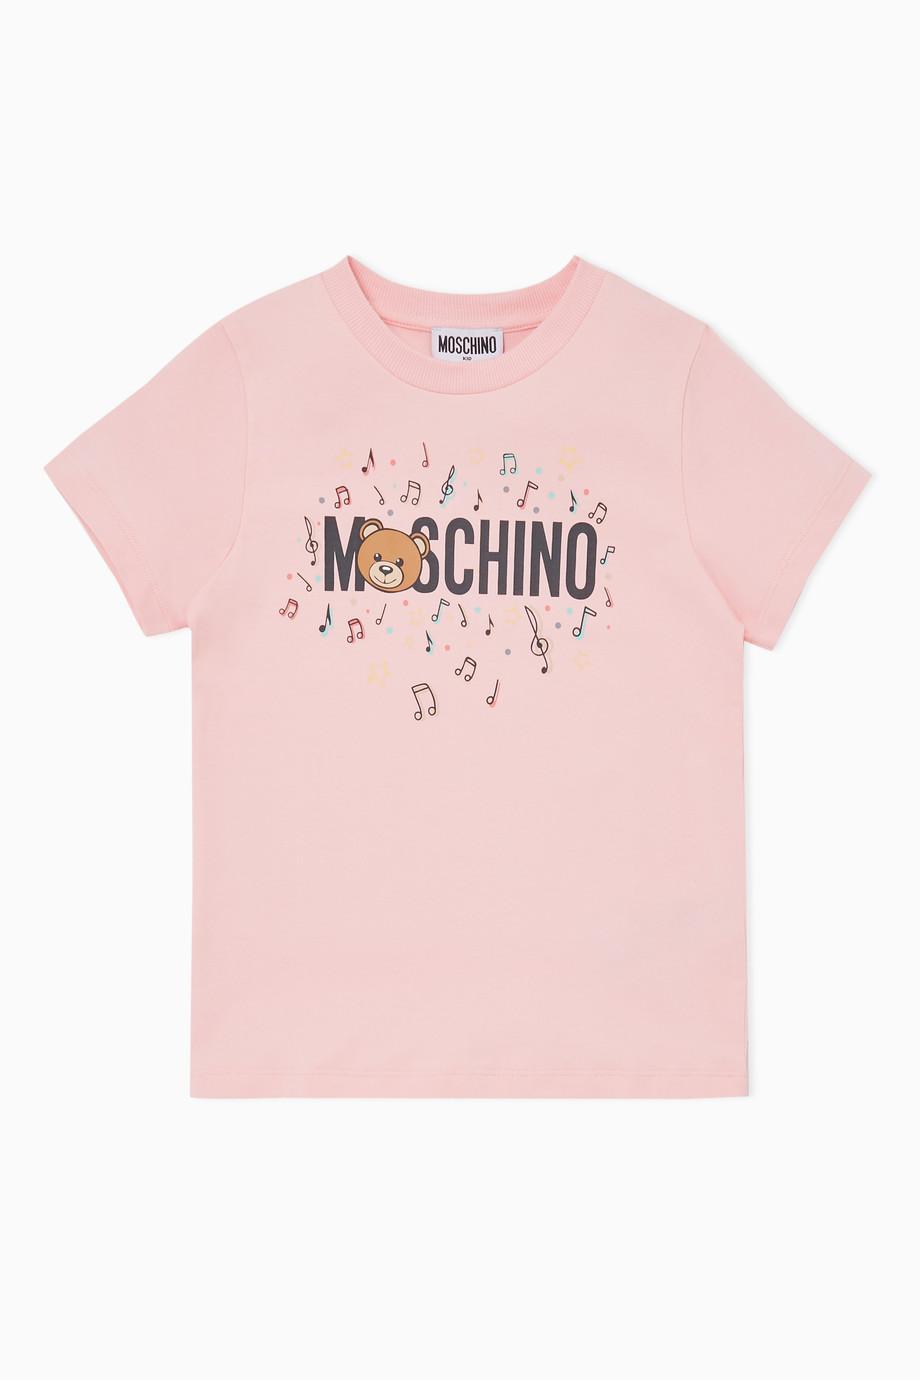 42086551f Shop Moschino Pink Music Logo Print T-Shirt for Kids | Ounass UAE